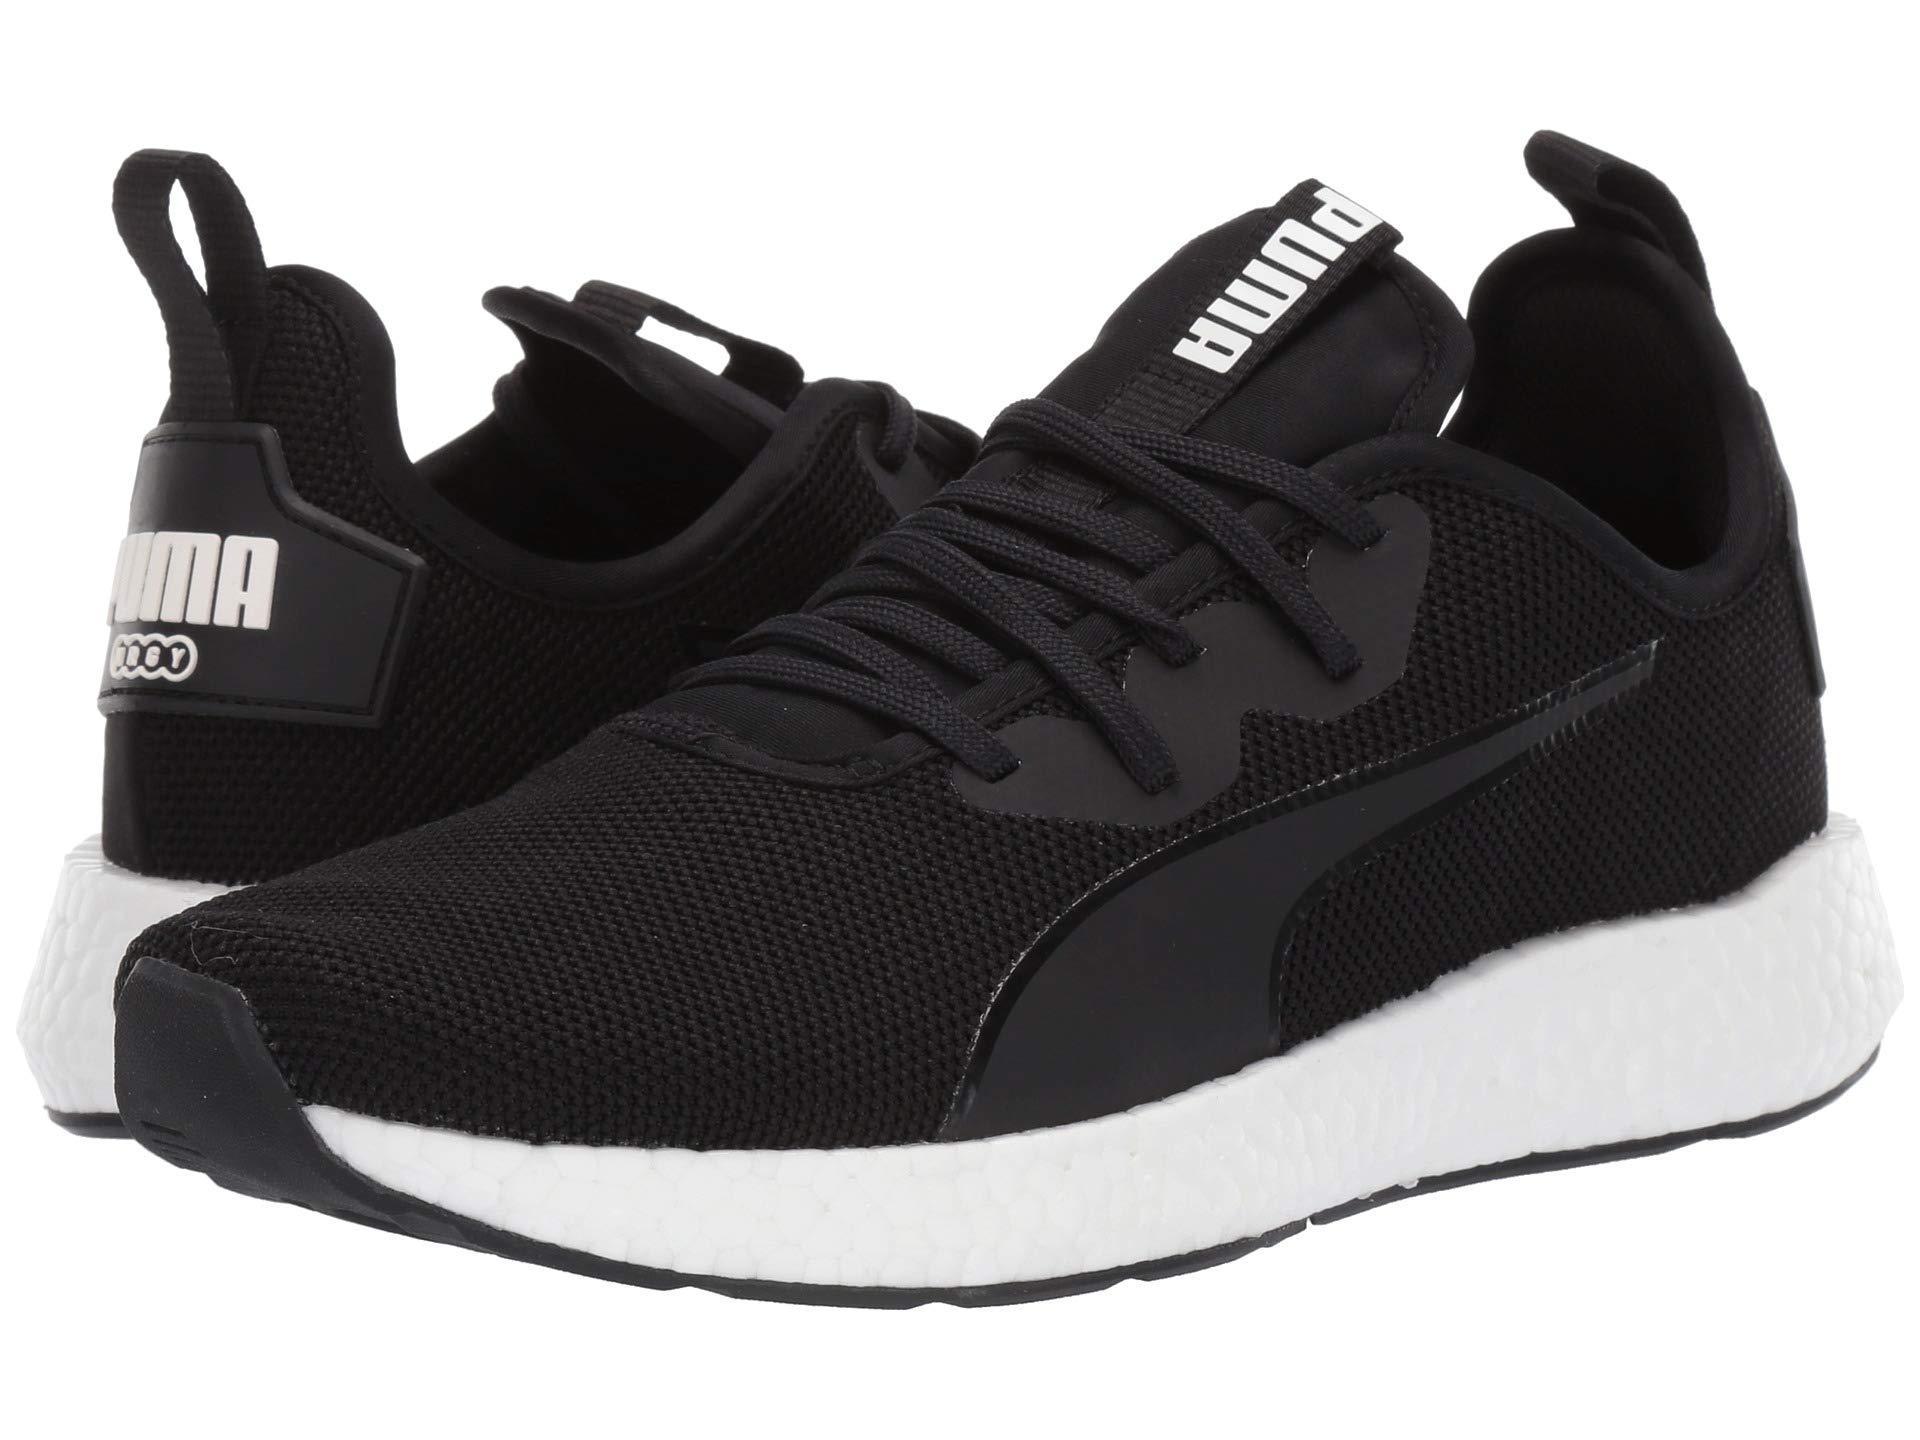 f3d4ca0fe6a PUMA - Nrgy Neko Sport ( Black  White) Women s Shoes - Lyst. View fullscreen